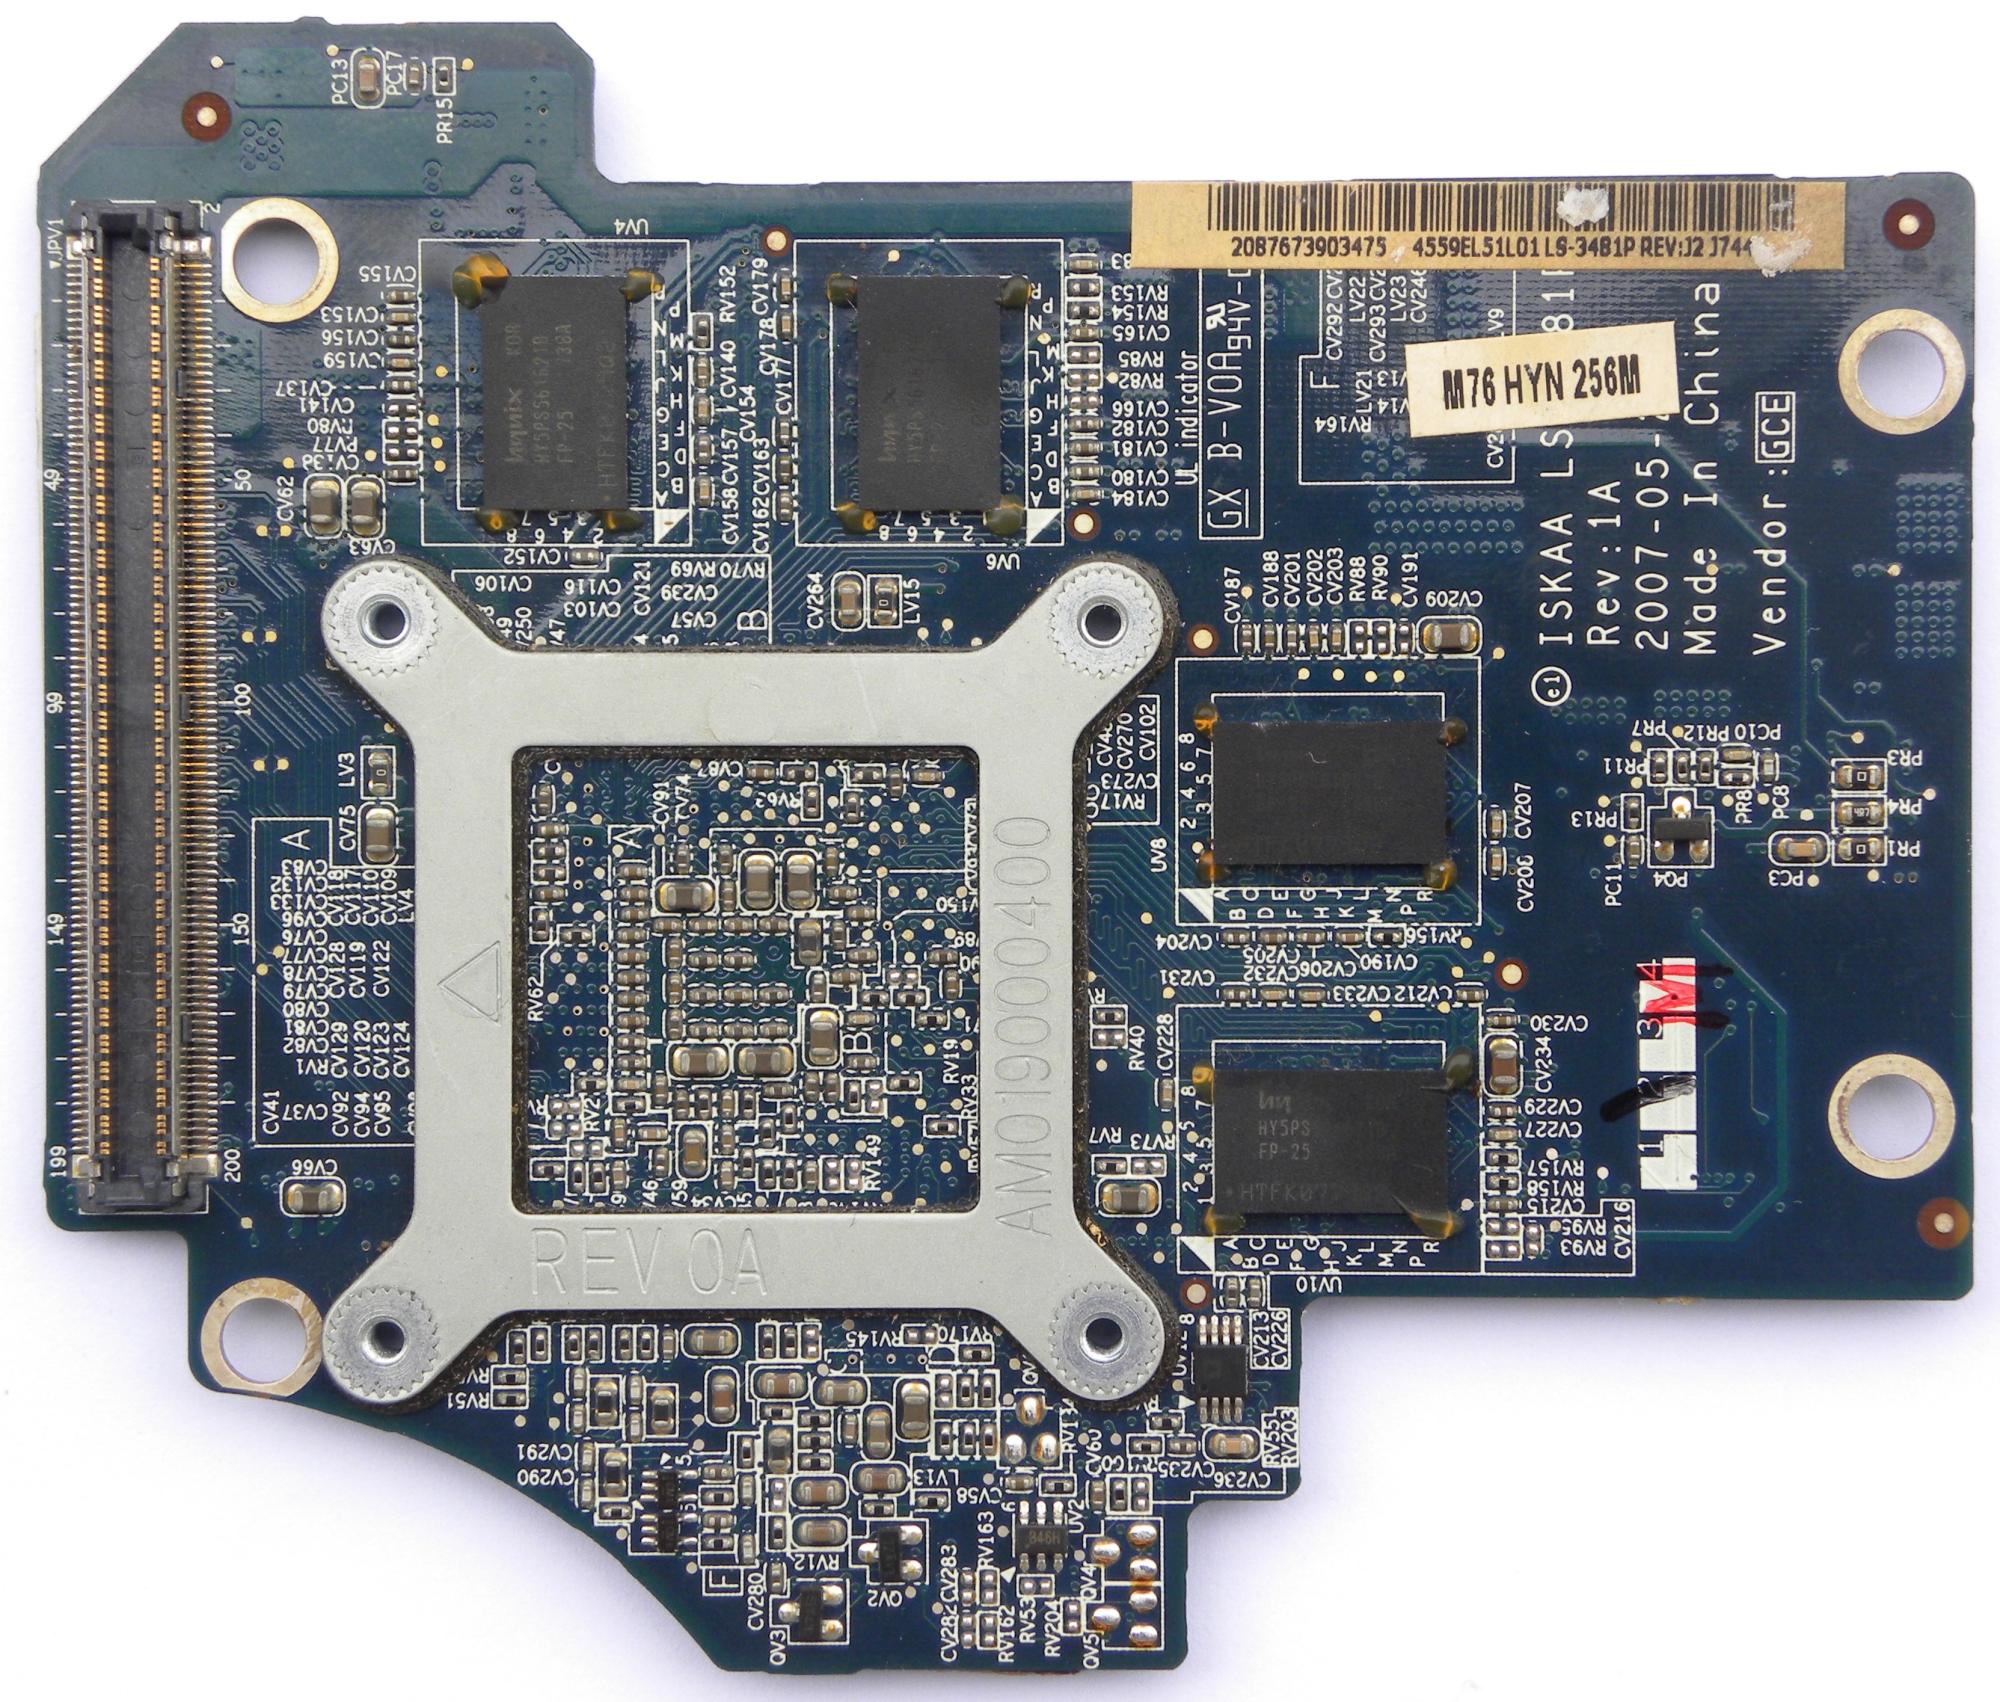 Ati Mobility Radeon Hd 4650 Latest Driver Download